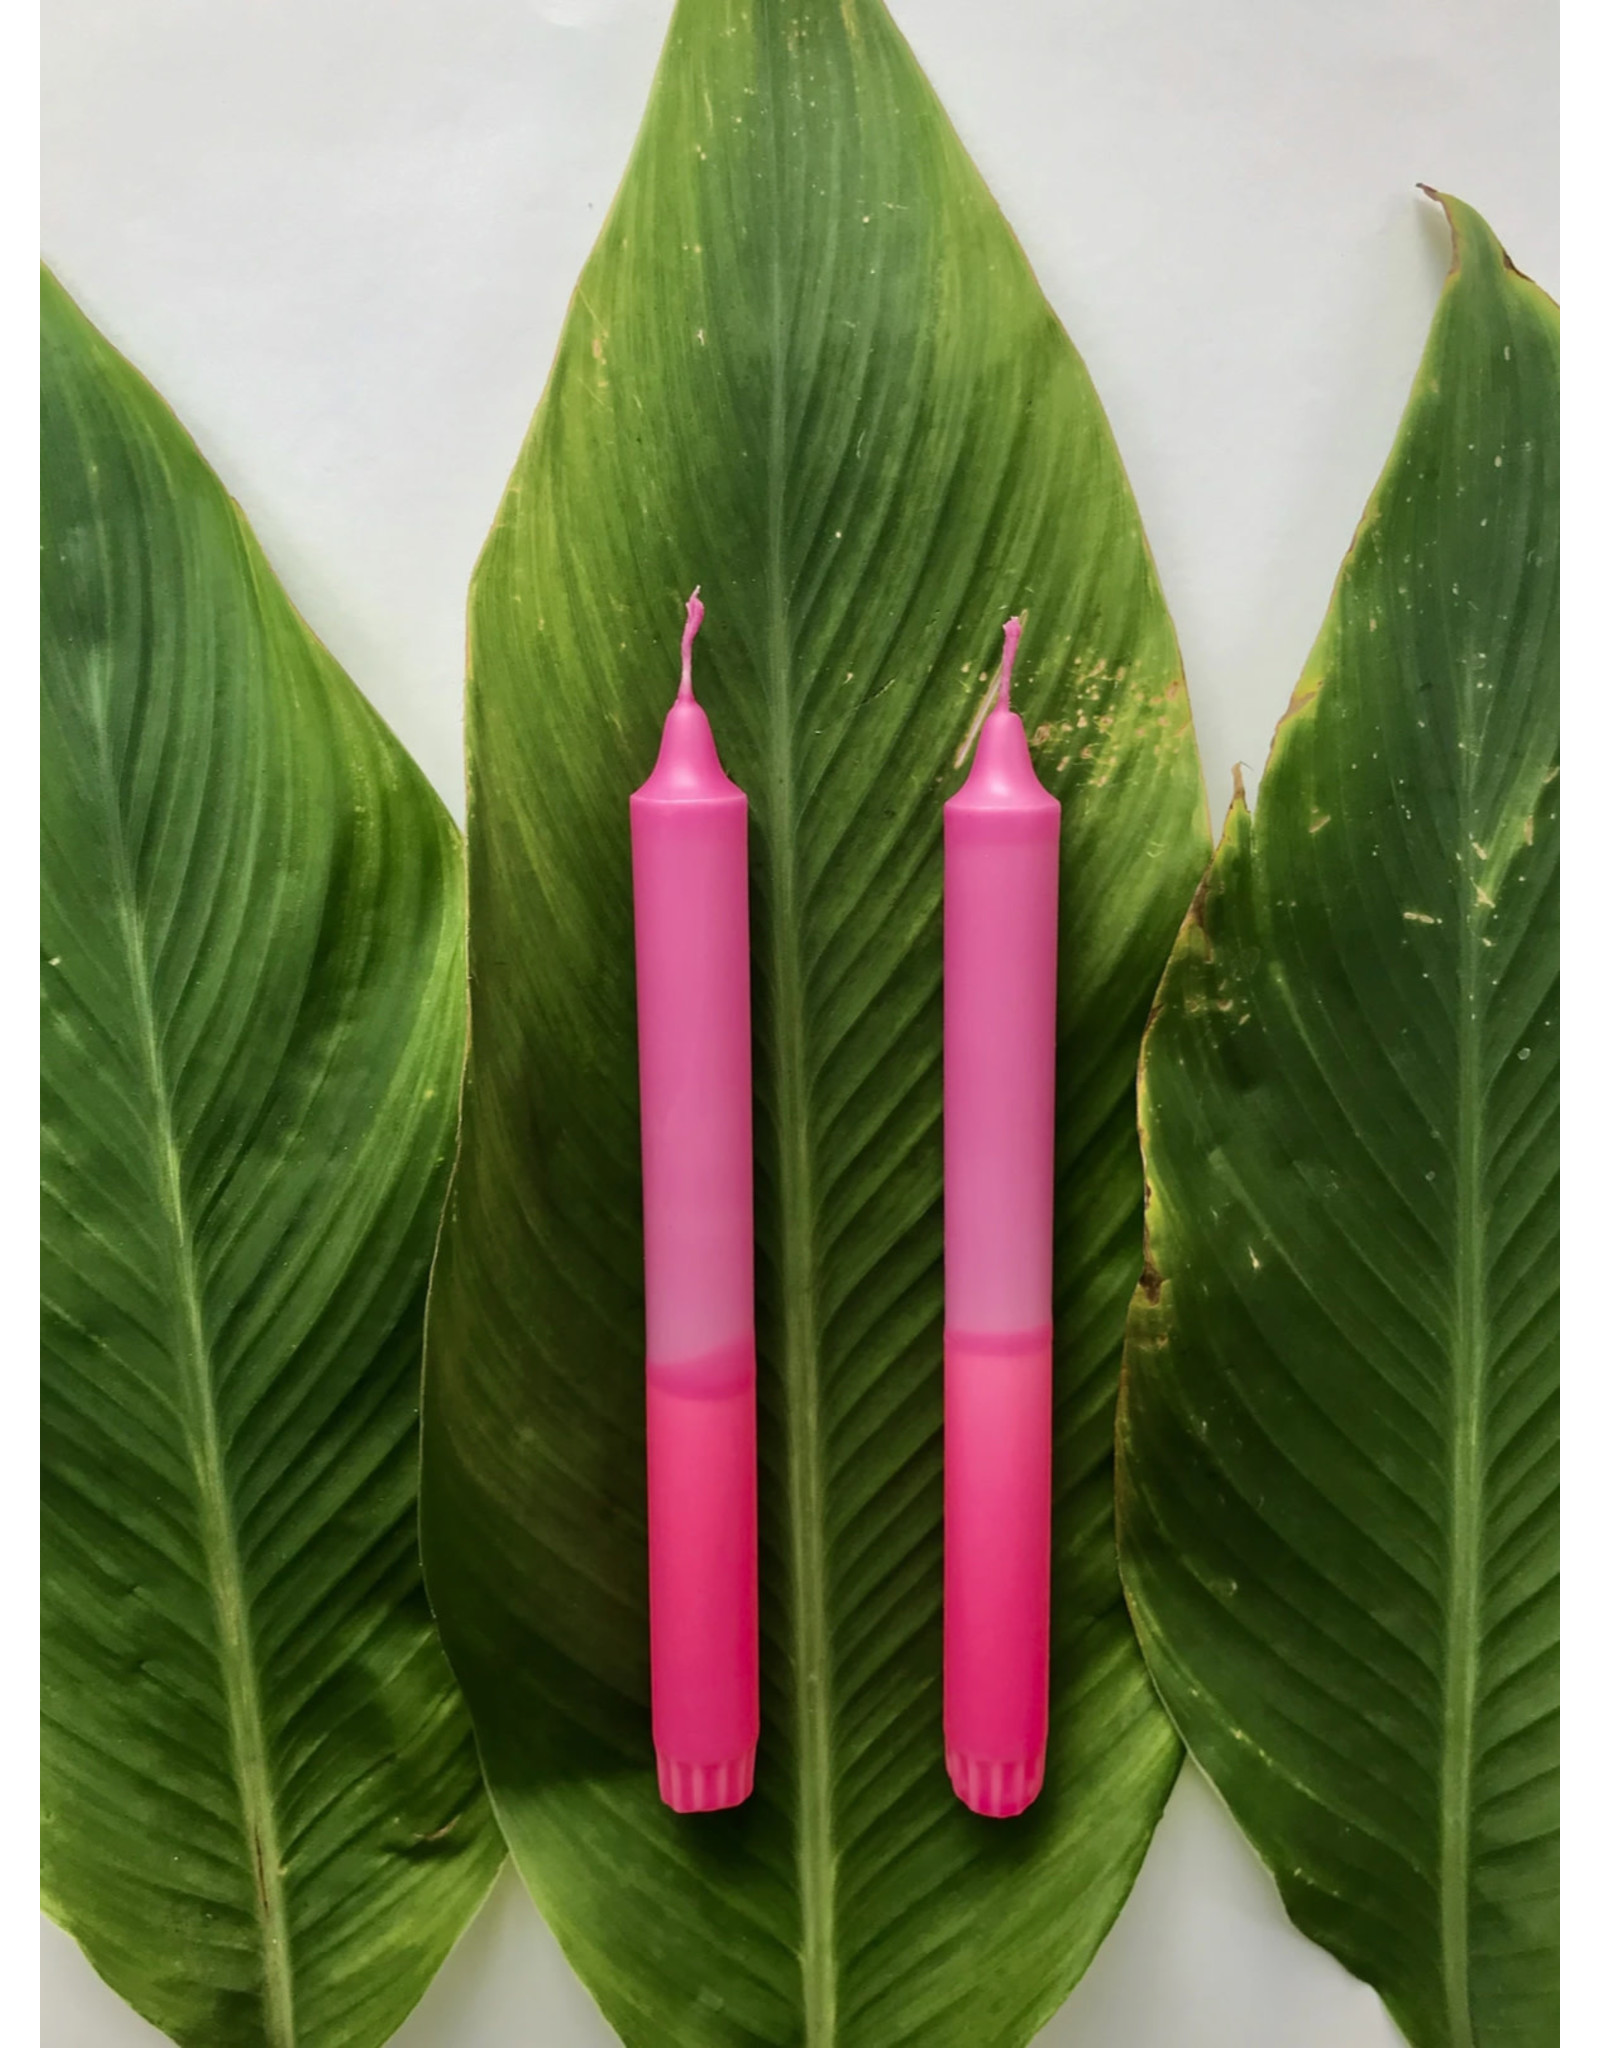 Studio-Sturmblau Kaars 1st. - Dusty pink  & Neon pink - 2,3 x 25 cm - Hand dipped - Brandtijd 7u